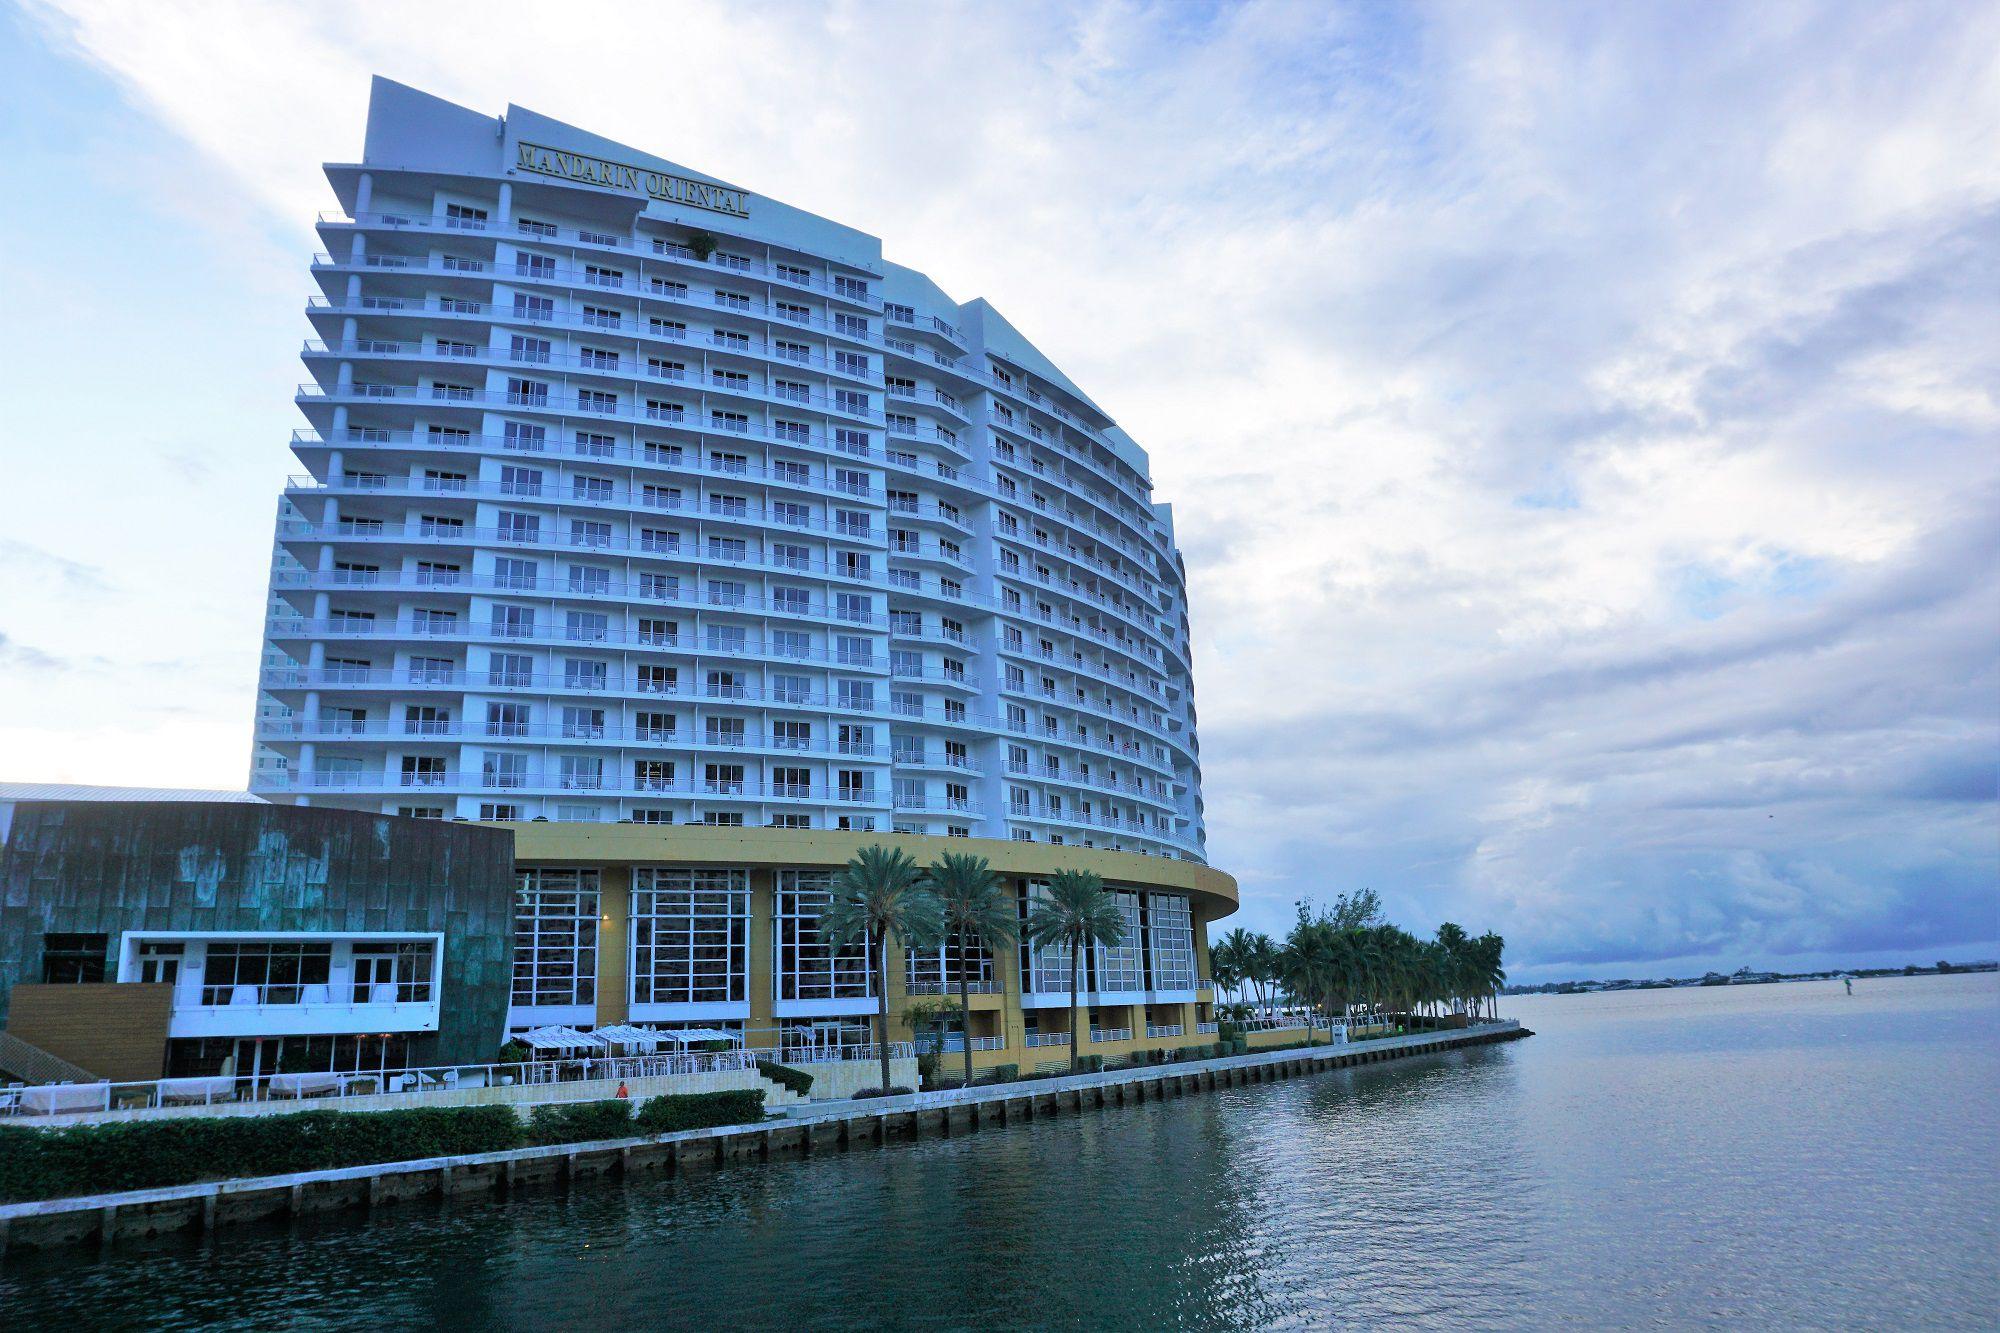 Mandarin Hotel in Miami, FL